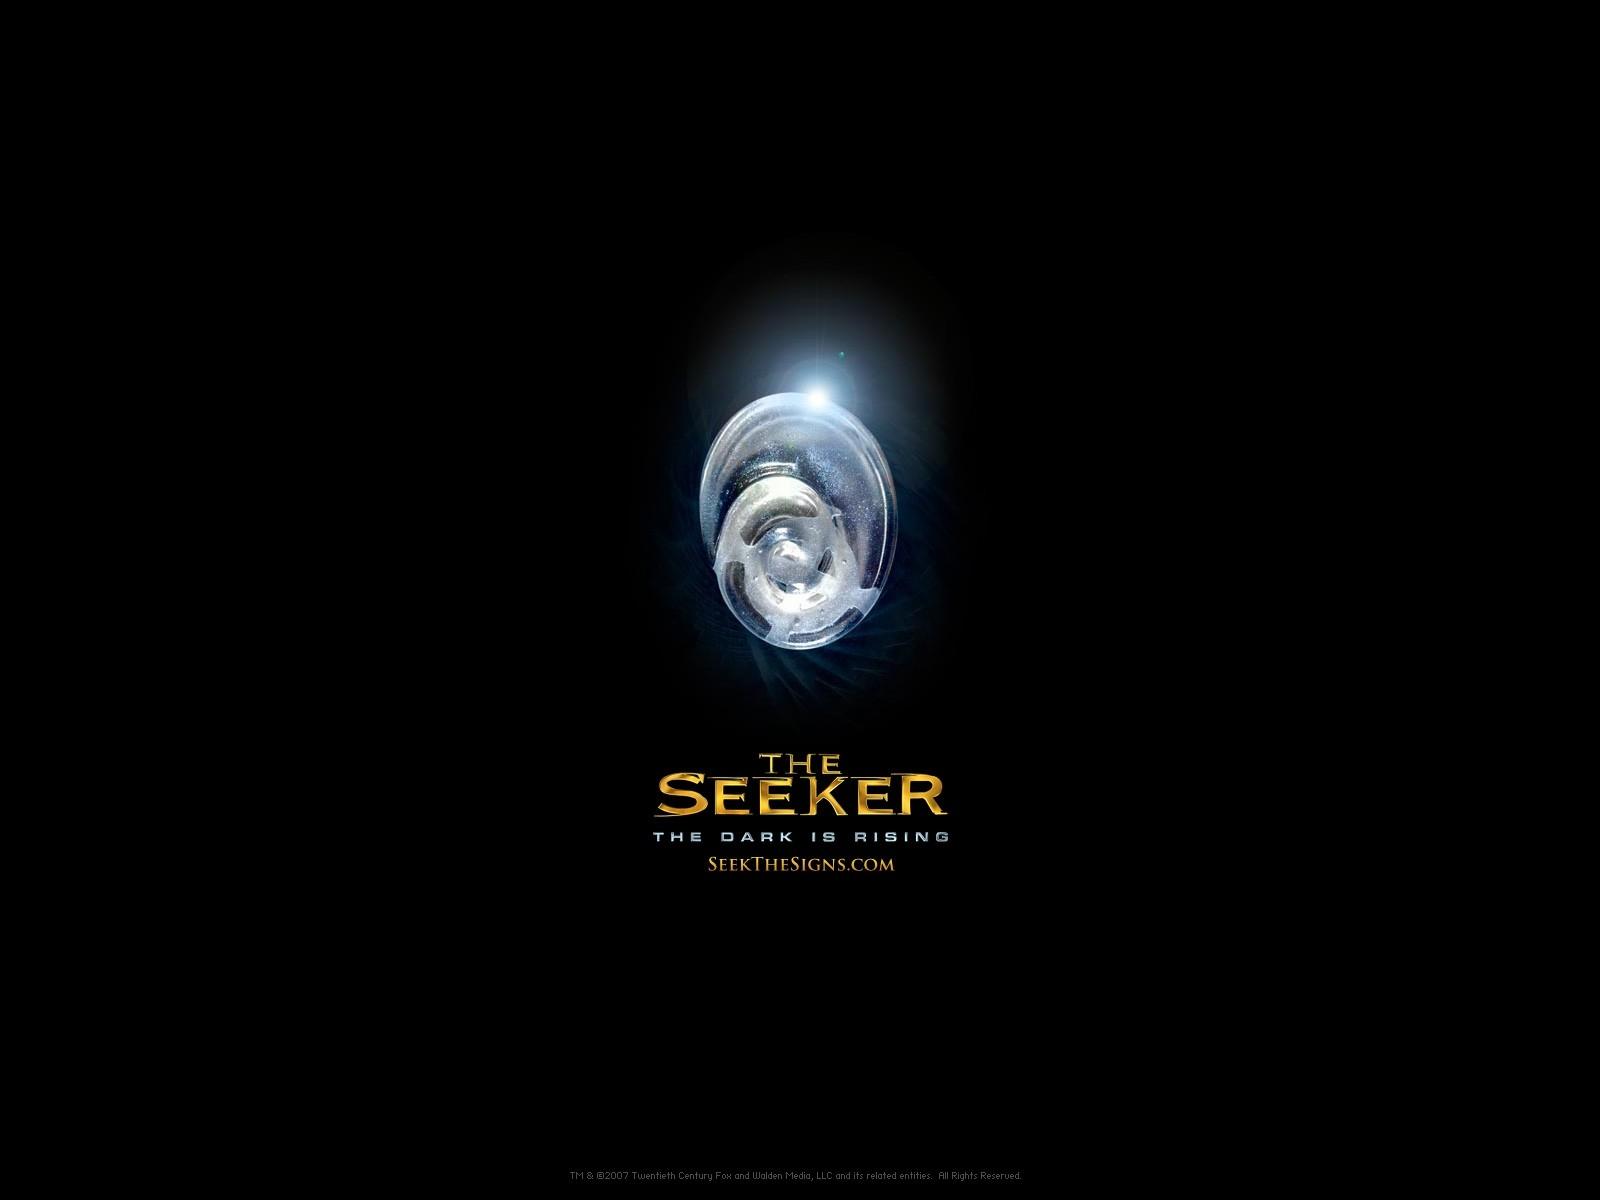 Wallpaper del film The Seeker: The Dark Is Rising